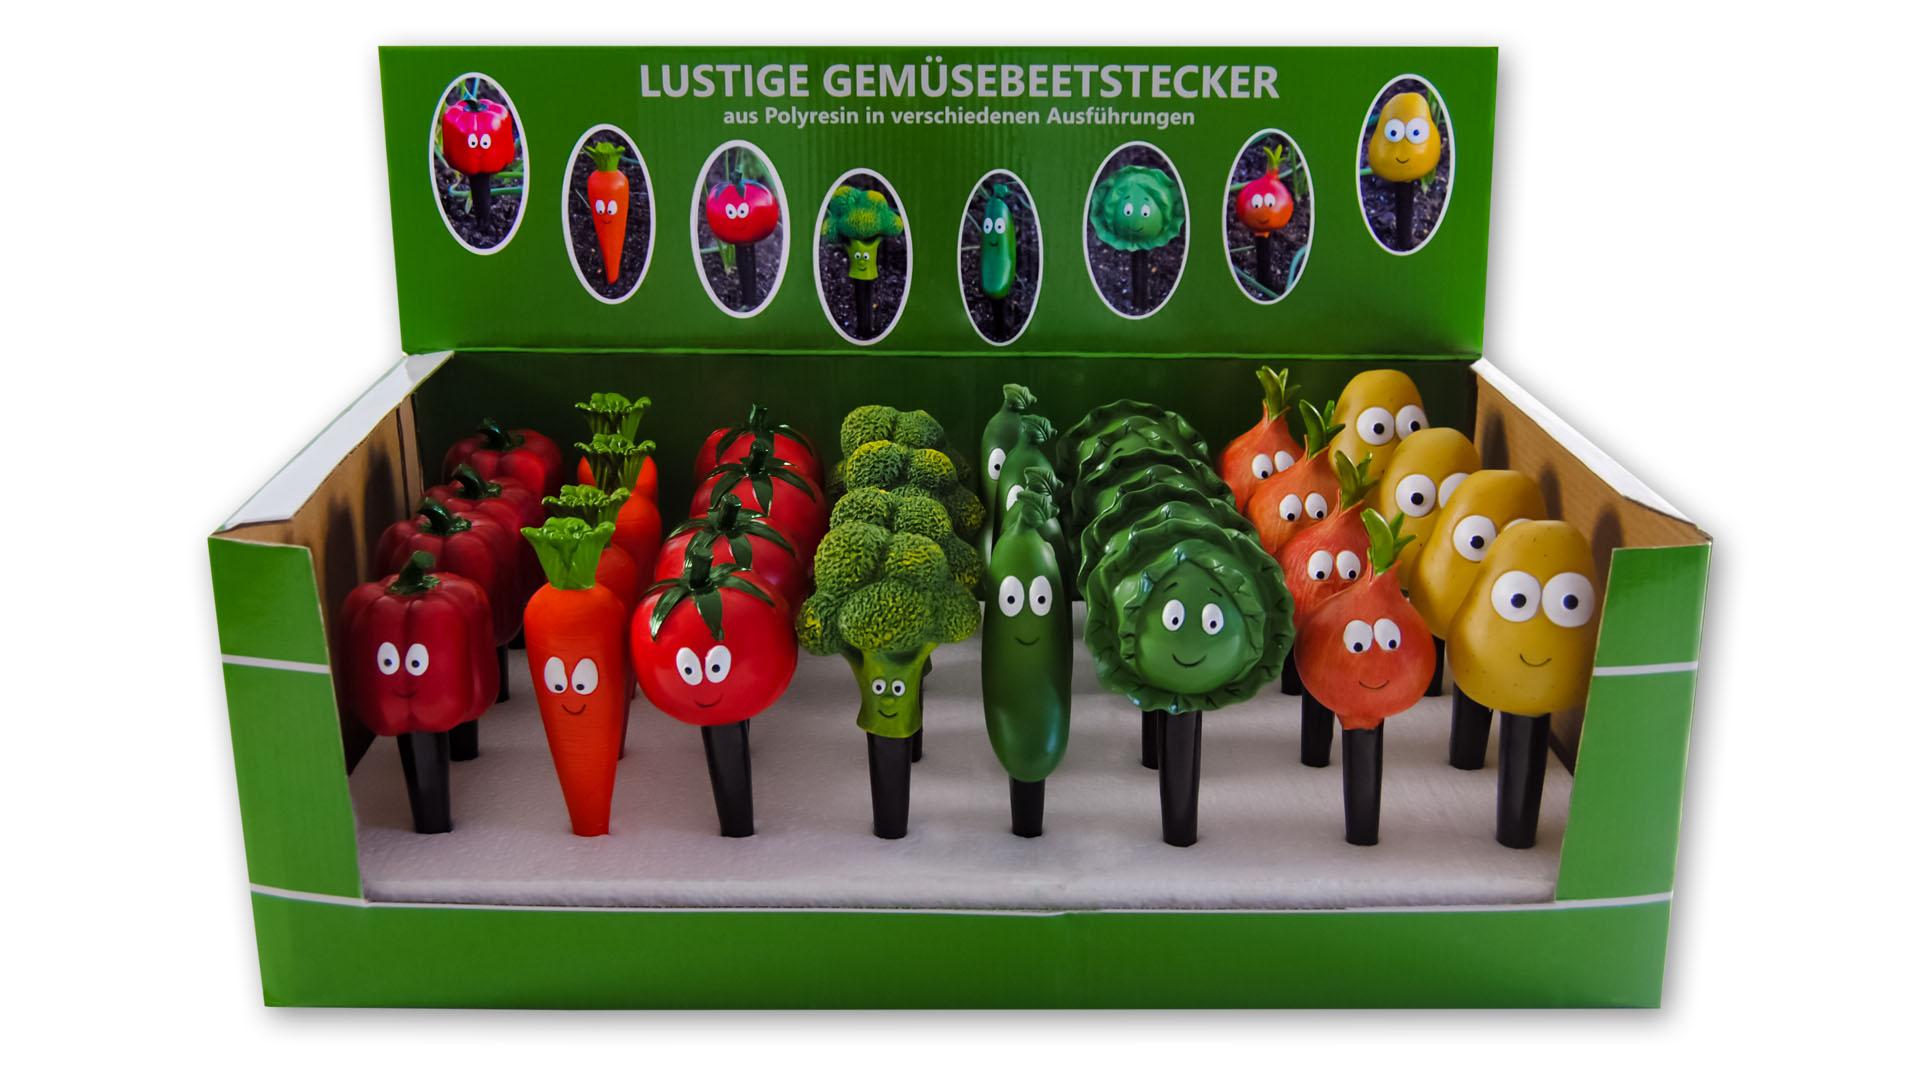 Gemüsebeetstecker im Verkaufsdisplay Image